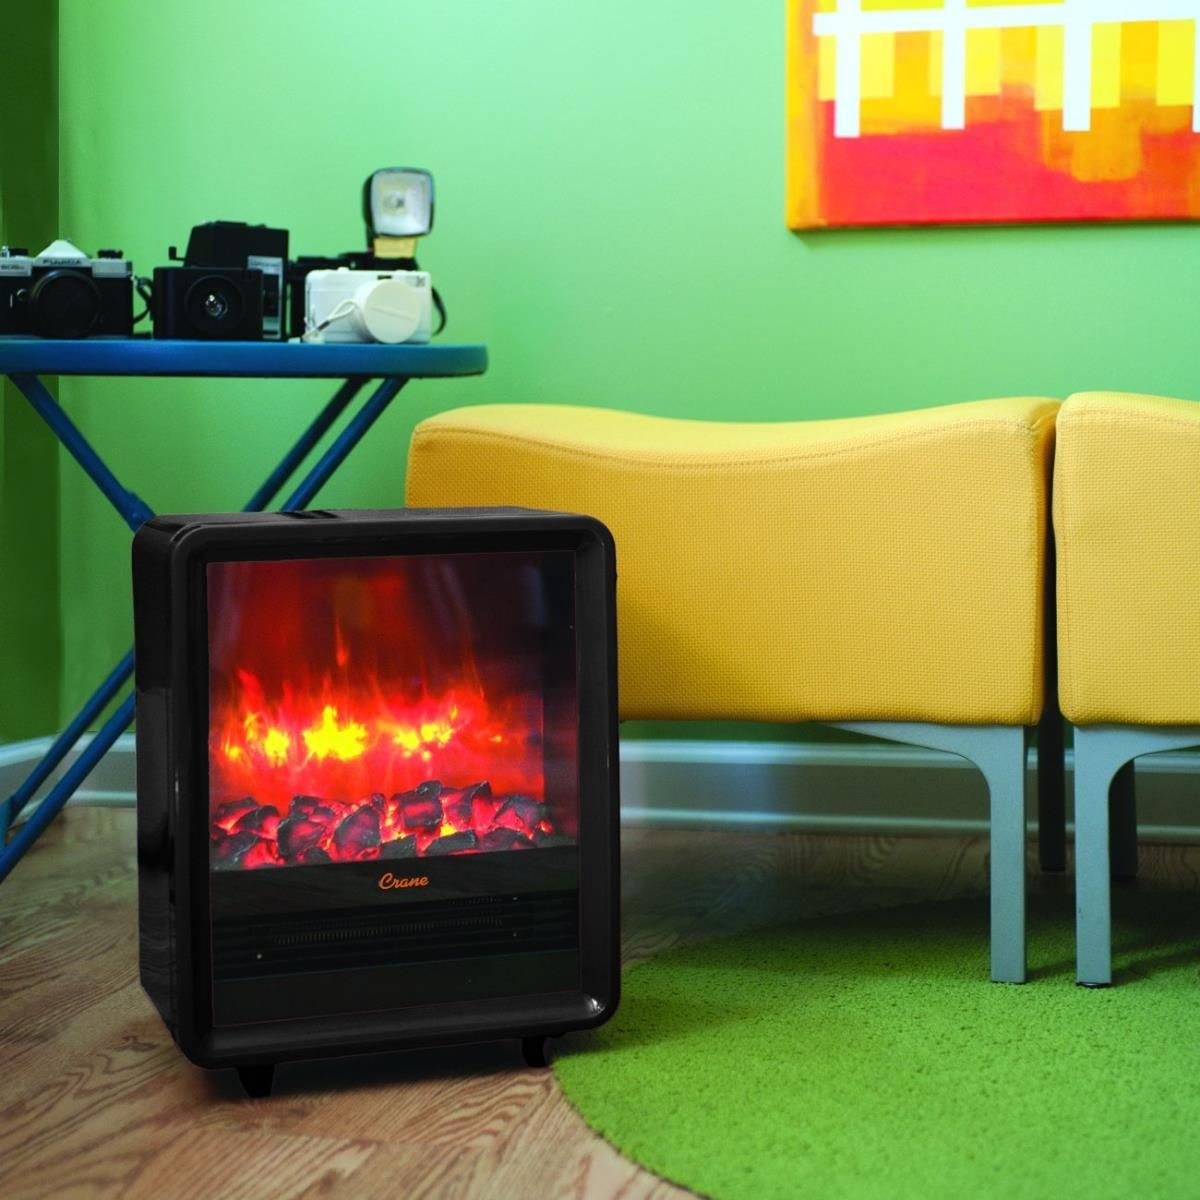 Crane Black Fireplace Heater Ee 8075bk Fireplace Heater